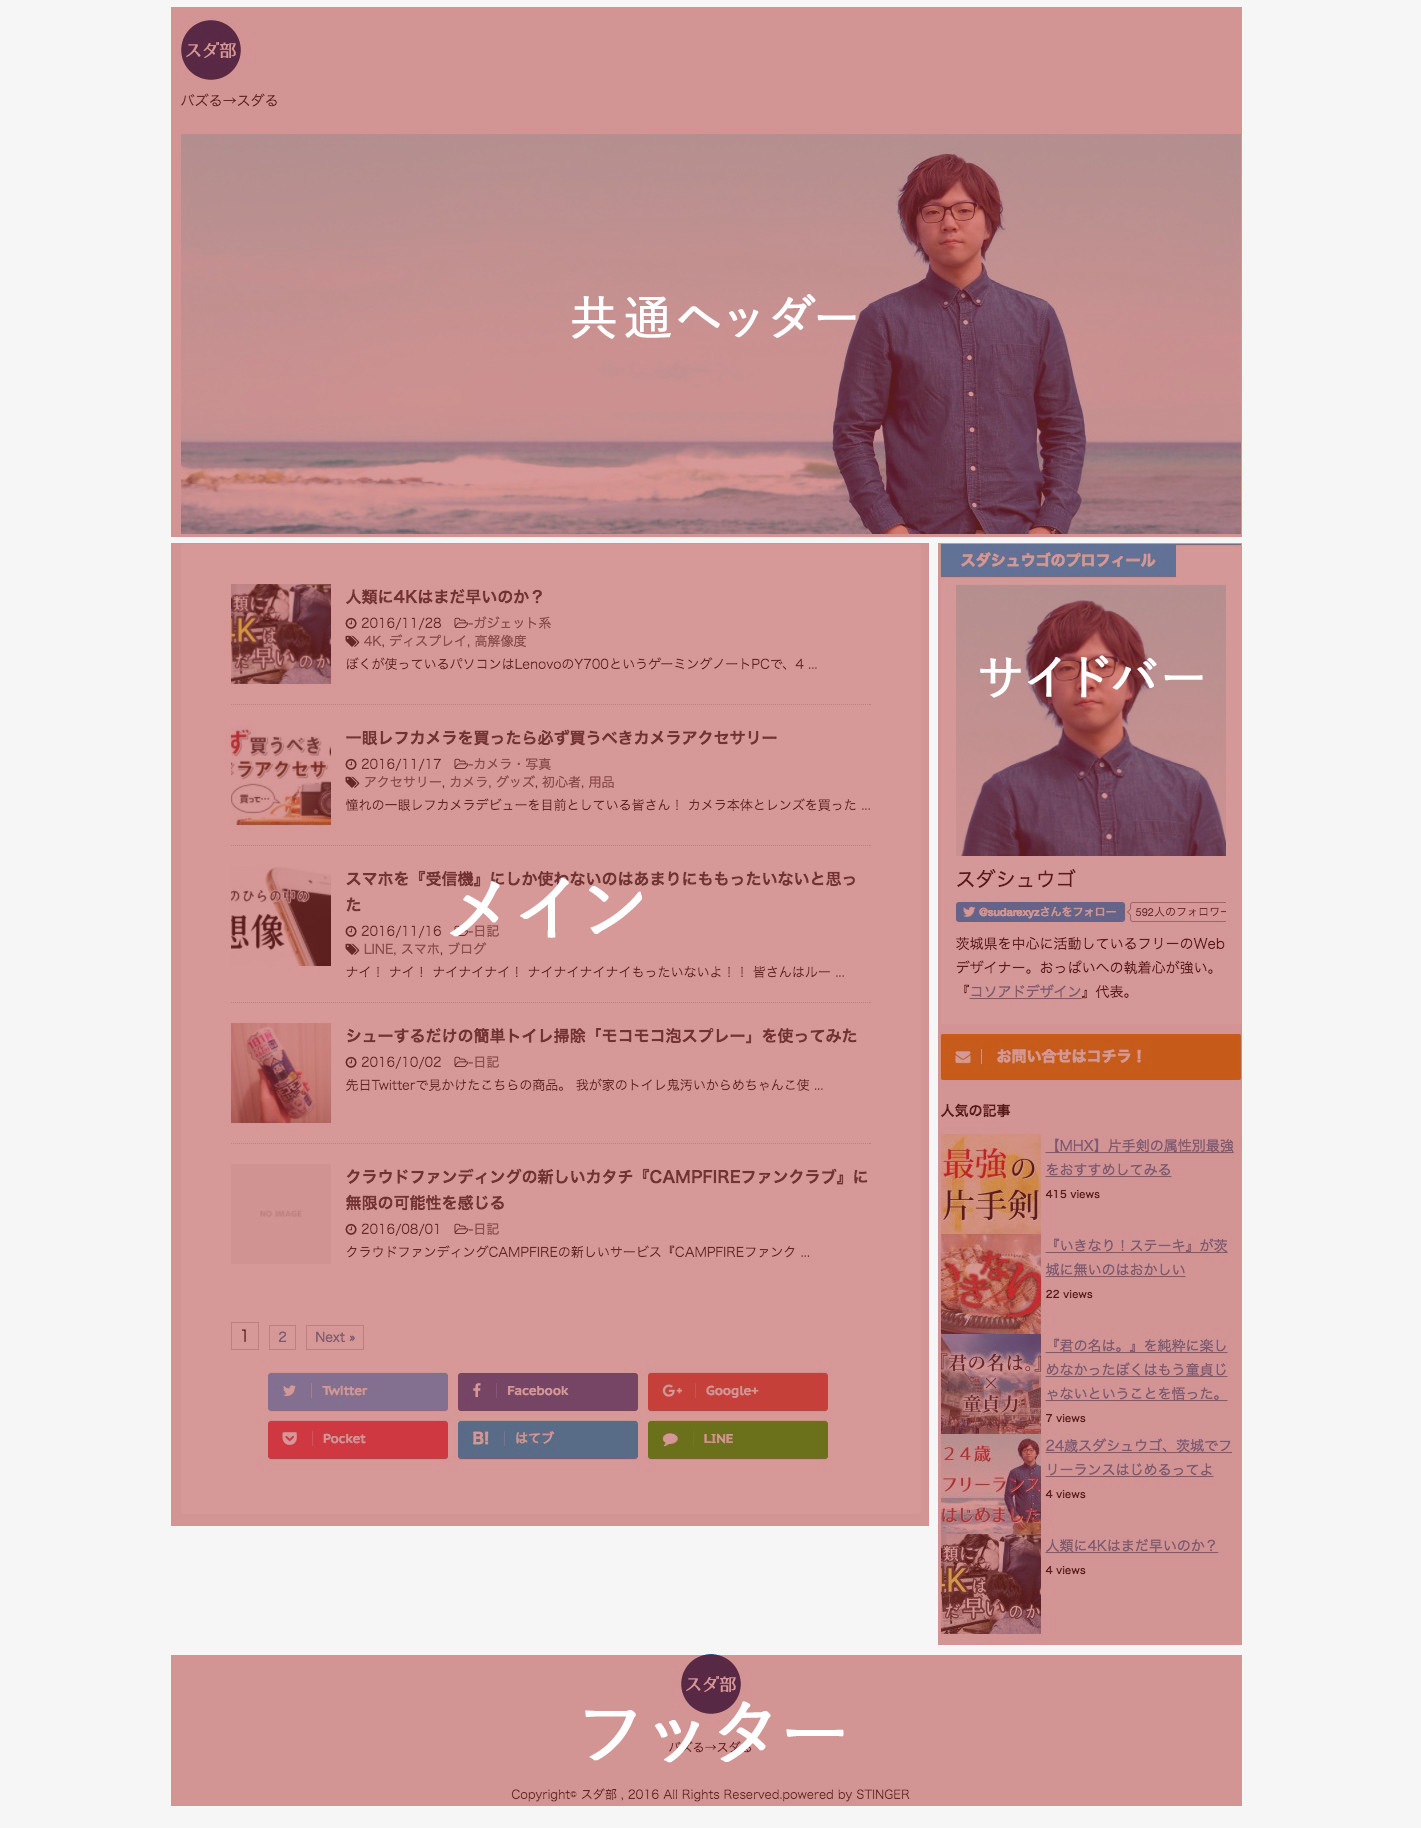 suda_layout.jpg